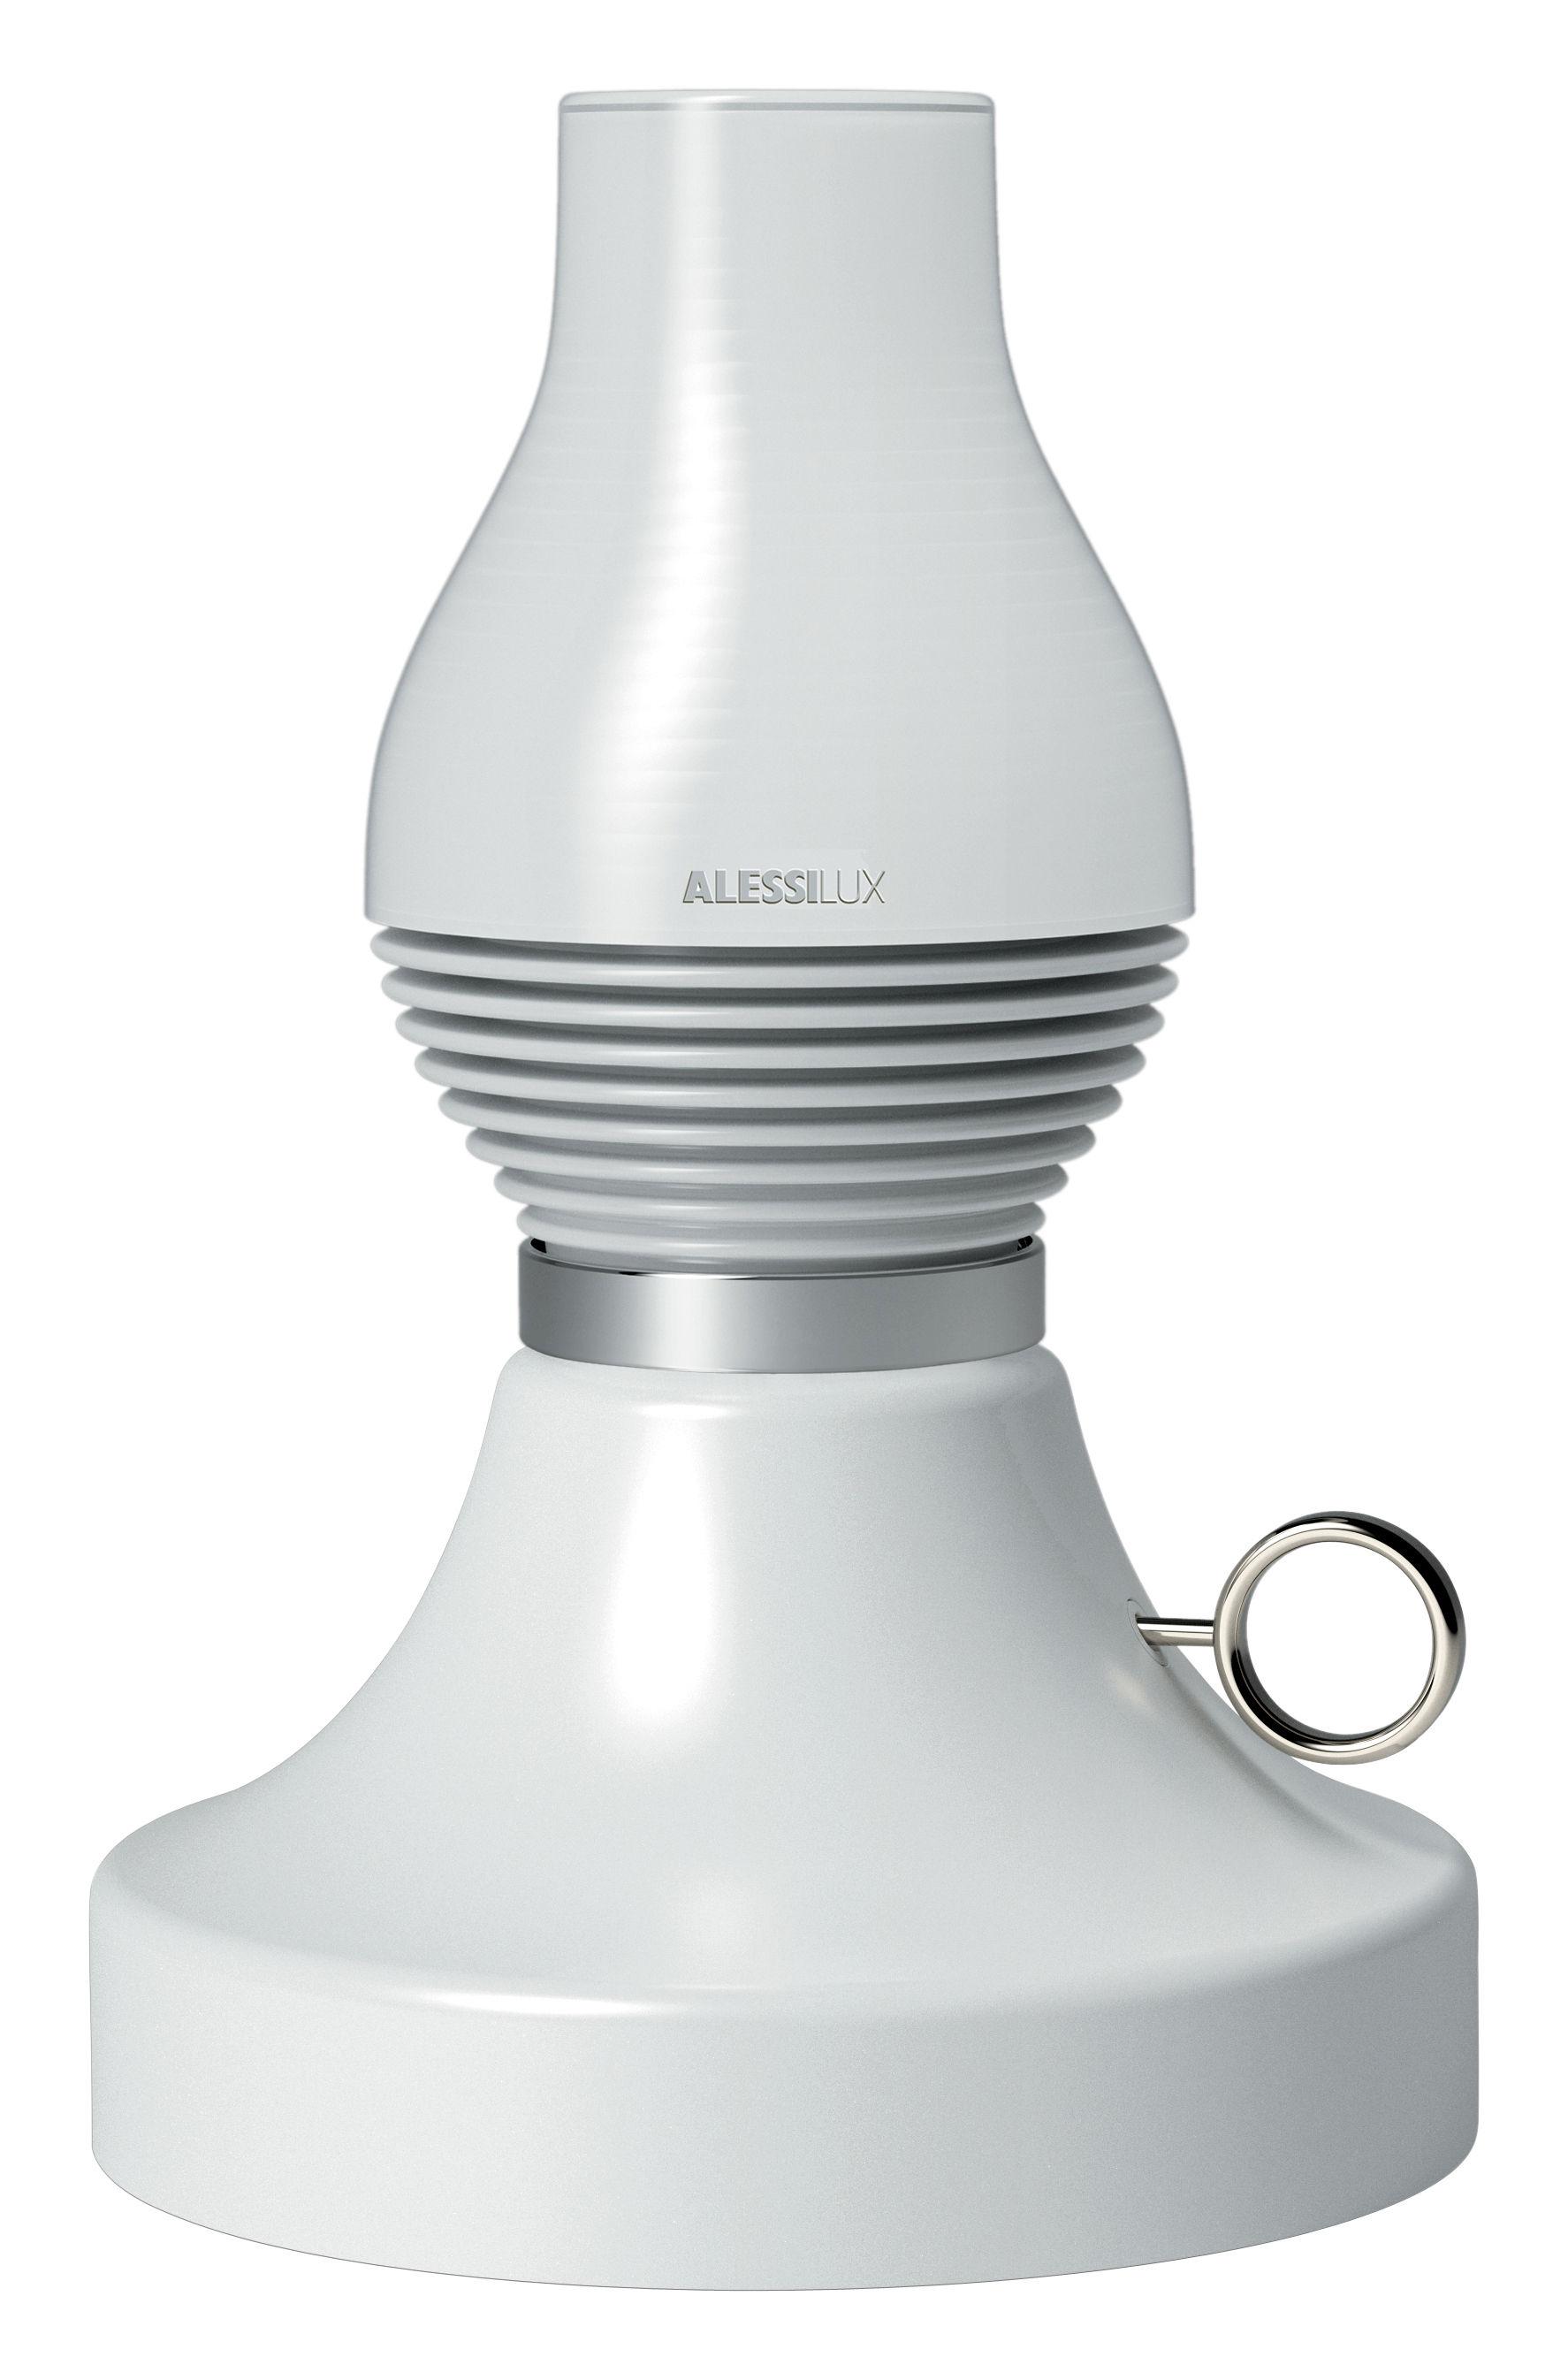 Lampada da tavolo lumi re paraffina alessilux base bianco lampadina bianca l 140 x h 16 1 x - Base lampada da tavolo ...